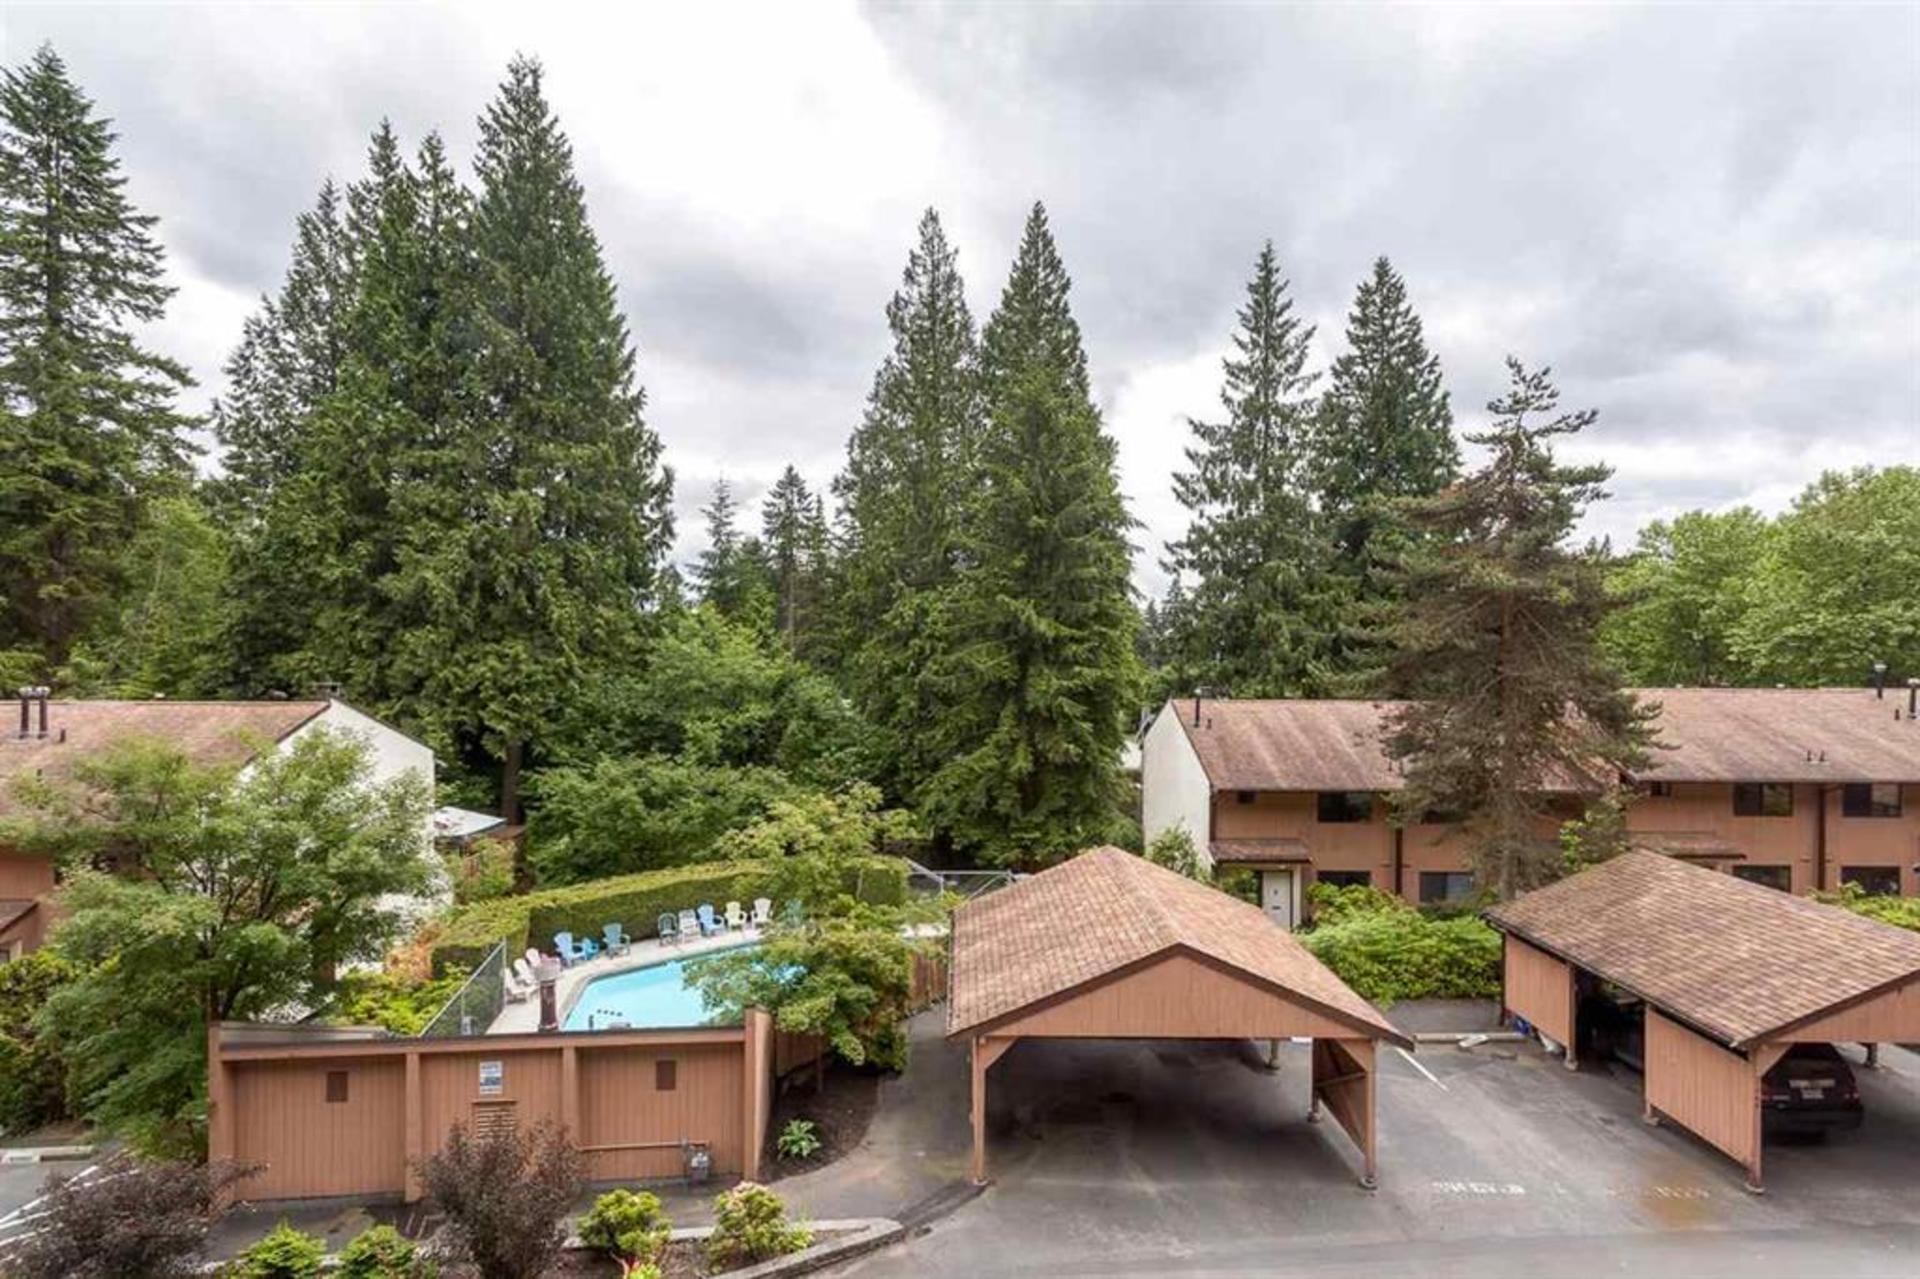 ec7a82243fb36d3902bfdf02c4c3d0e5 at 1542 Mcnair Drive, Lynn Valley, North Vancouver